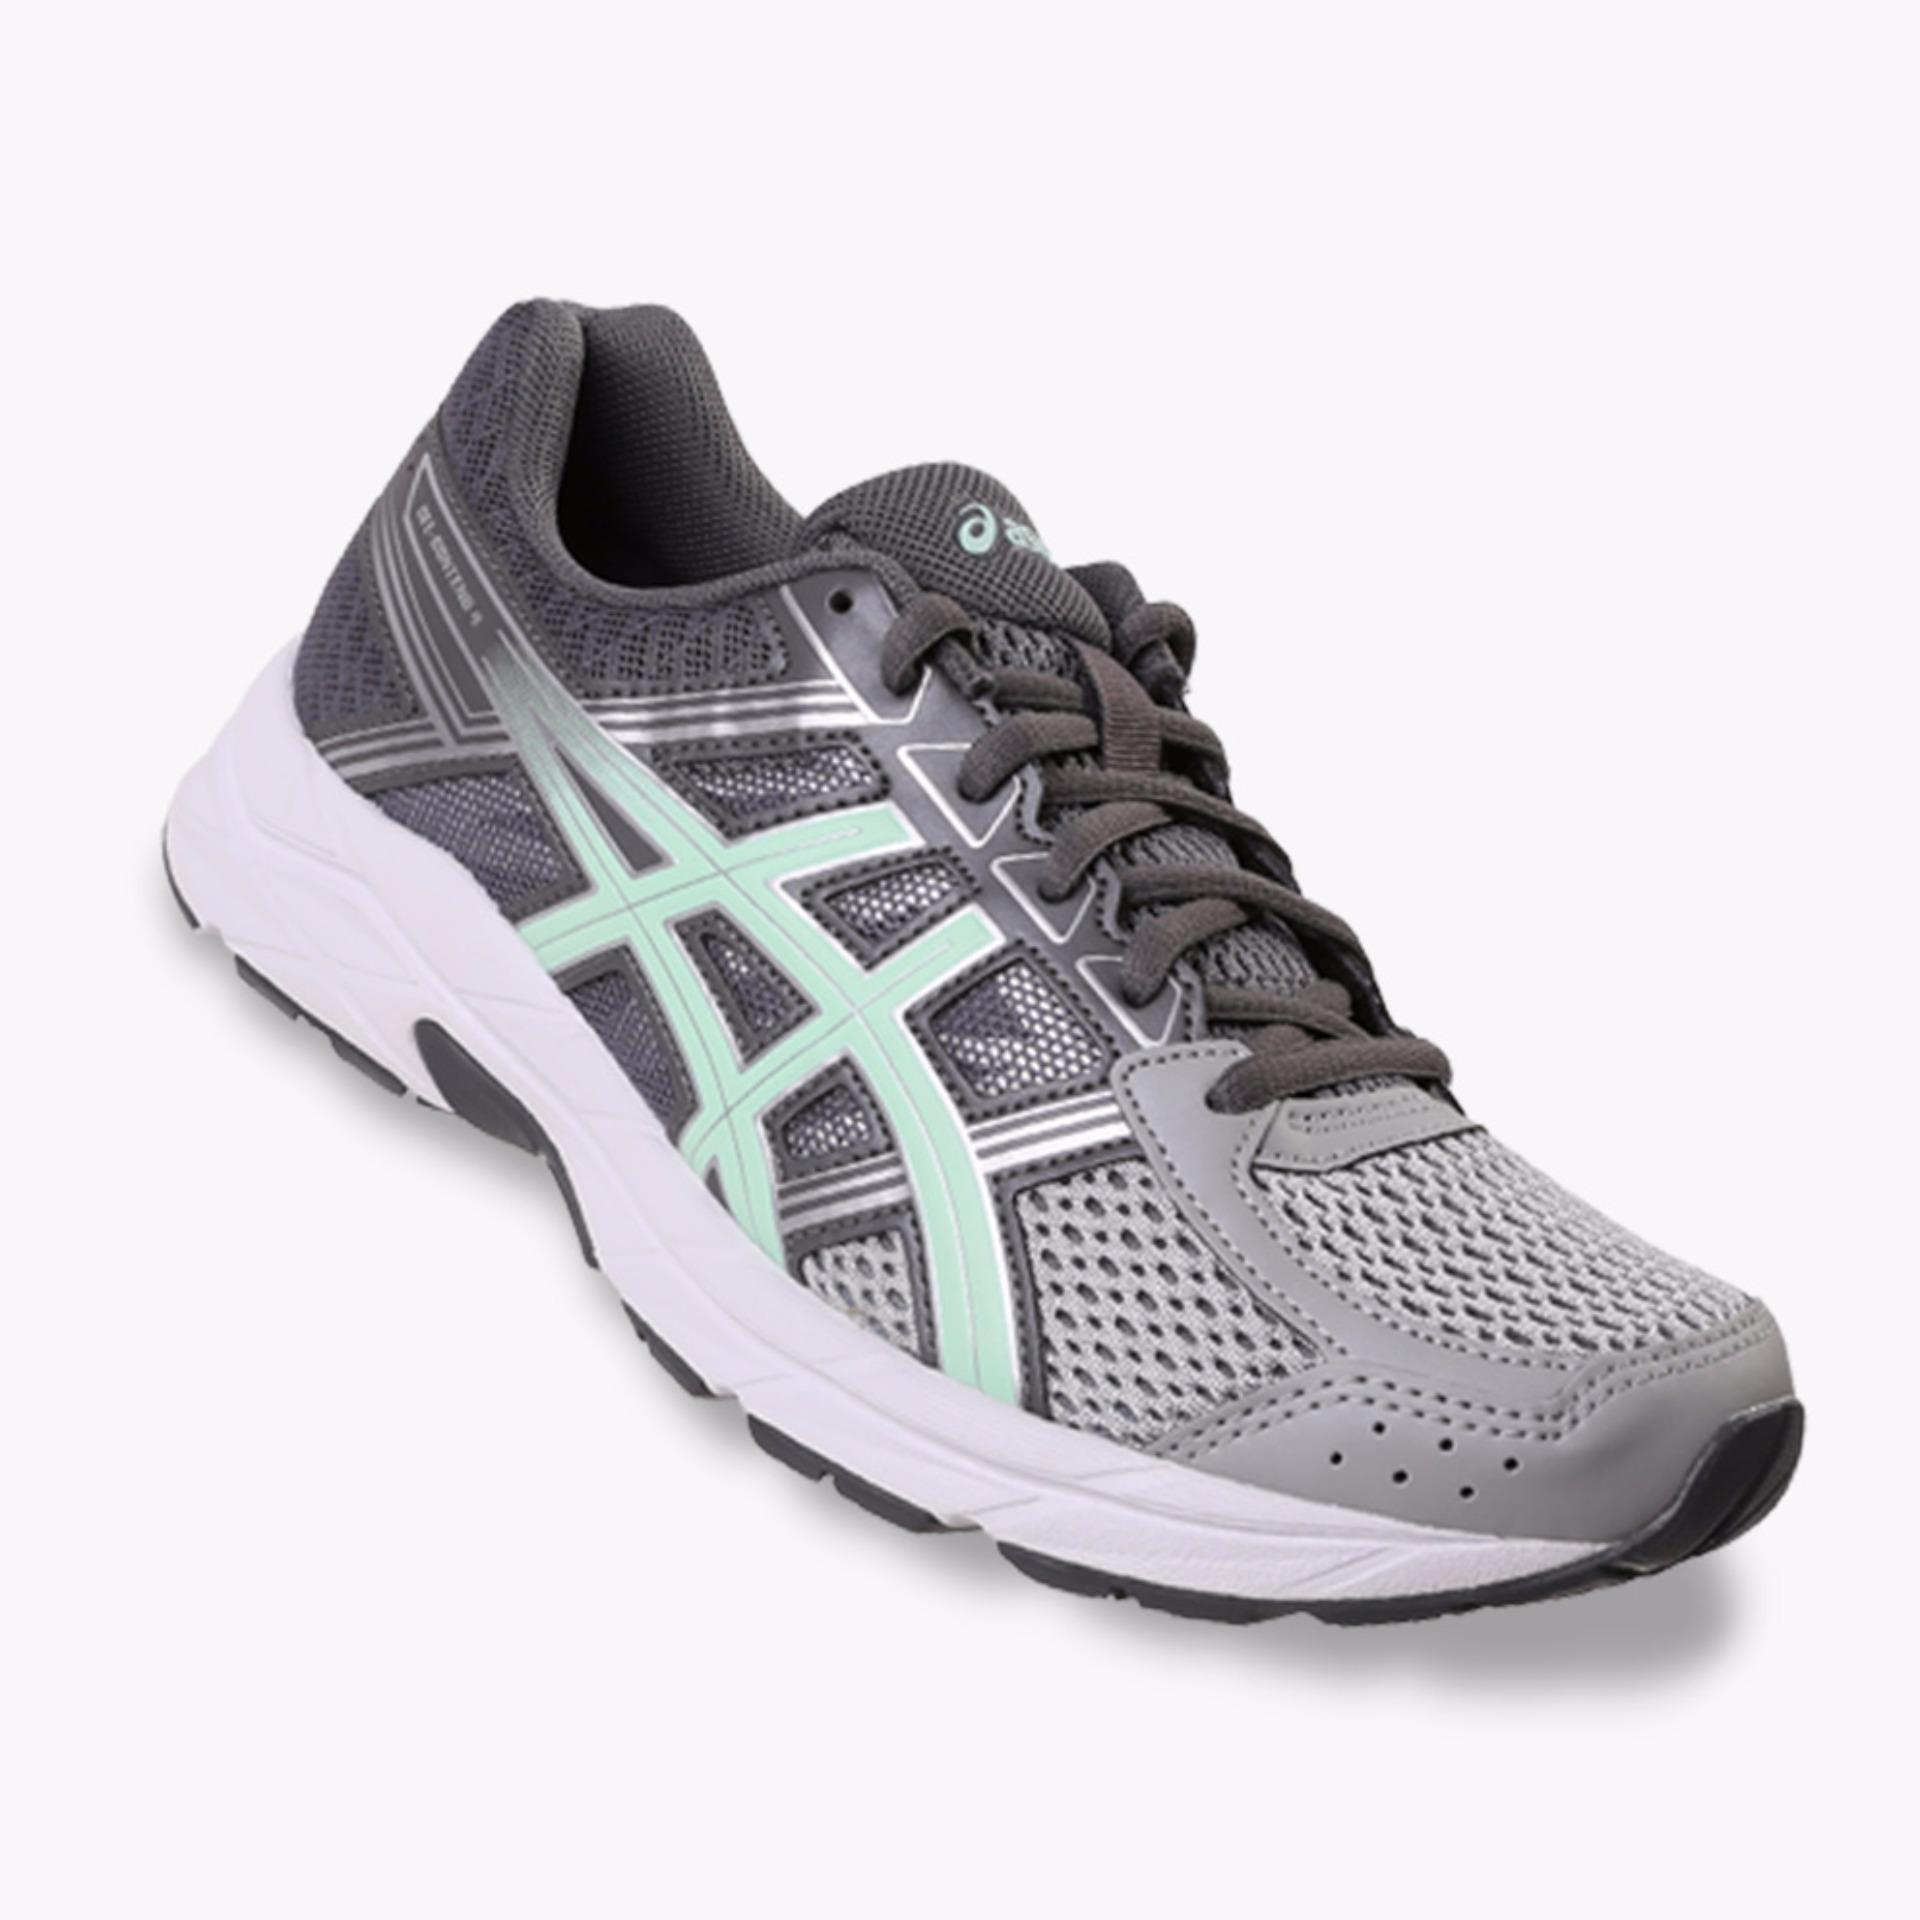 Asics Gel-Contend 4 Women's Running Shoes - Abu-abu